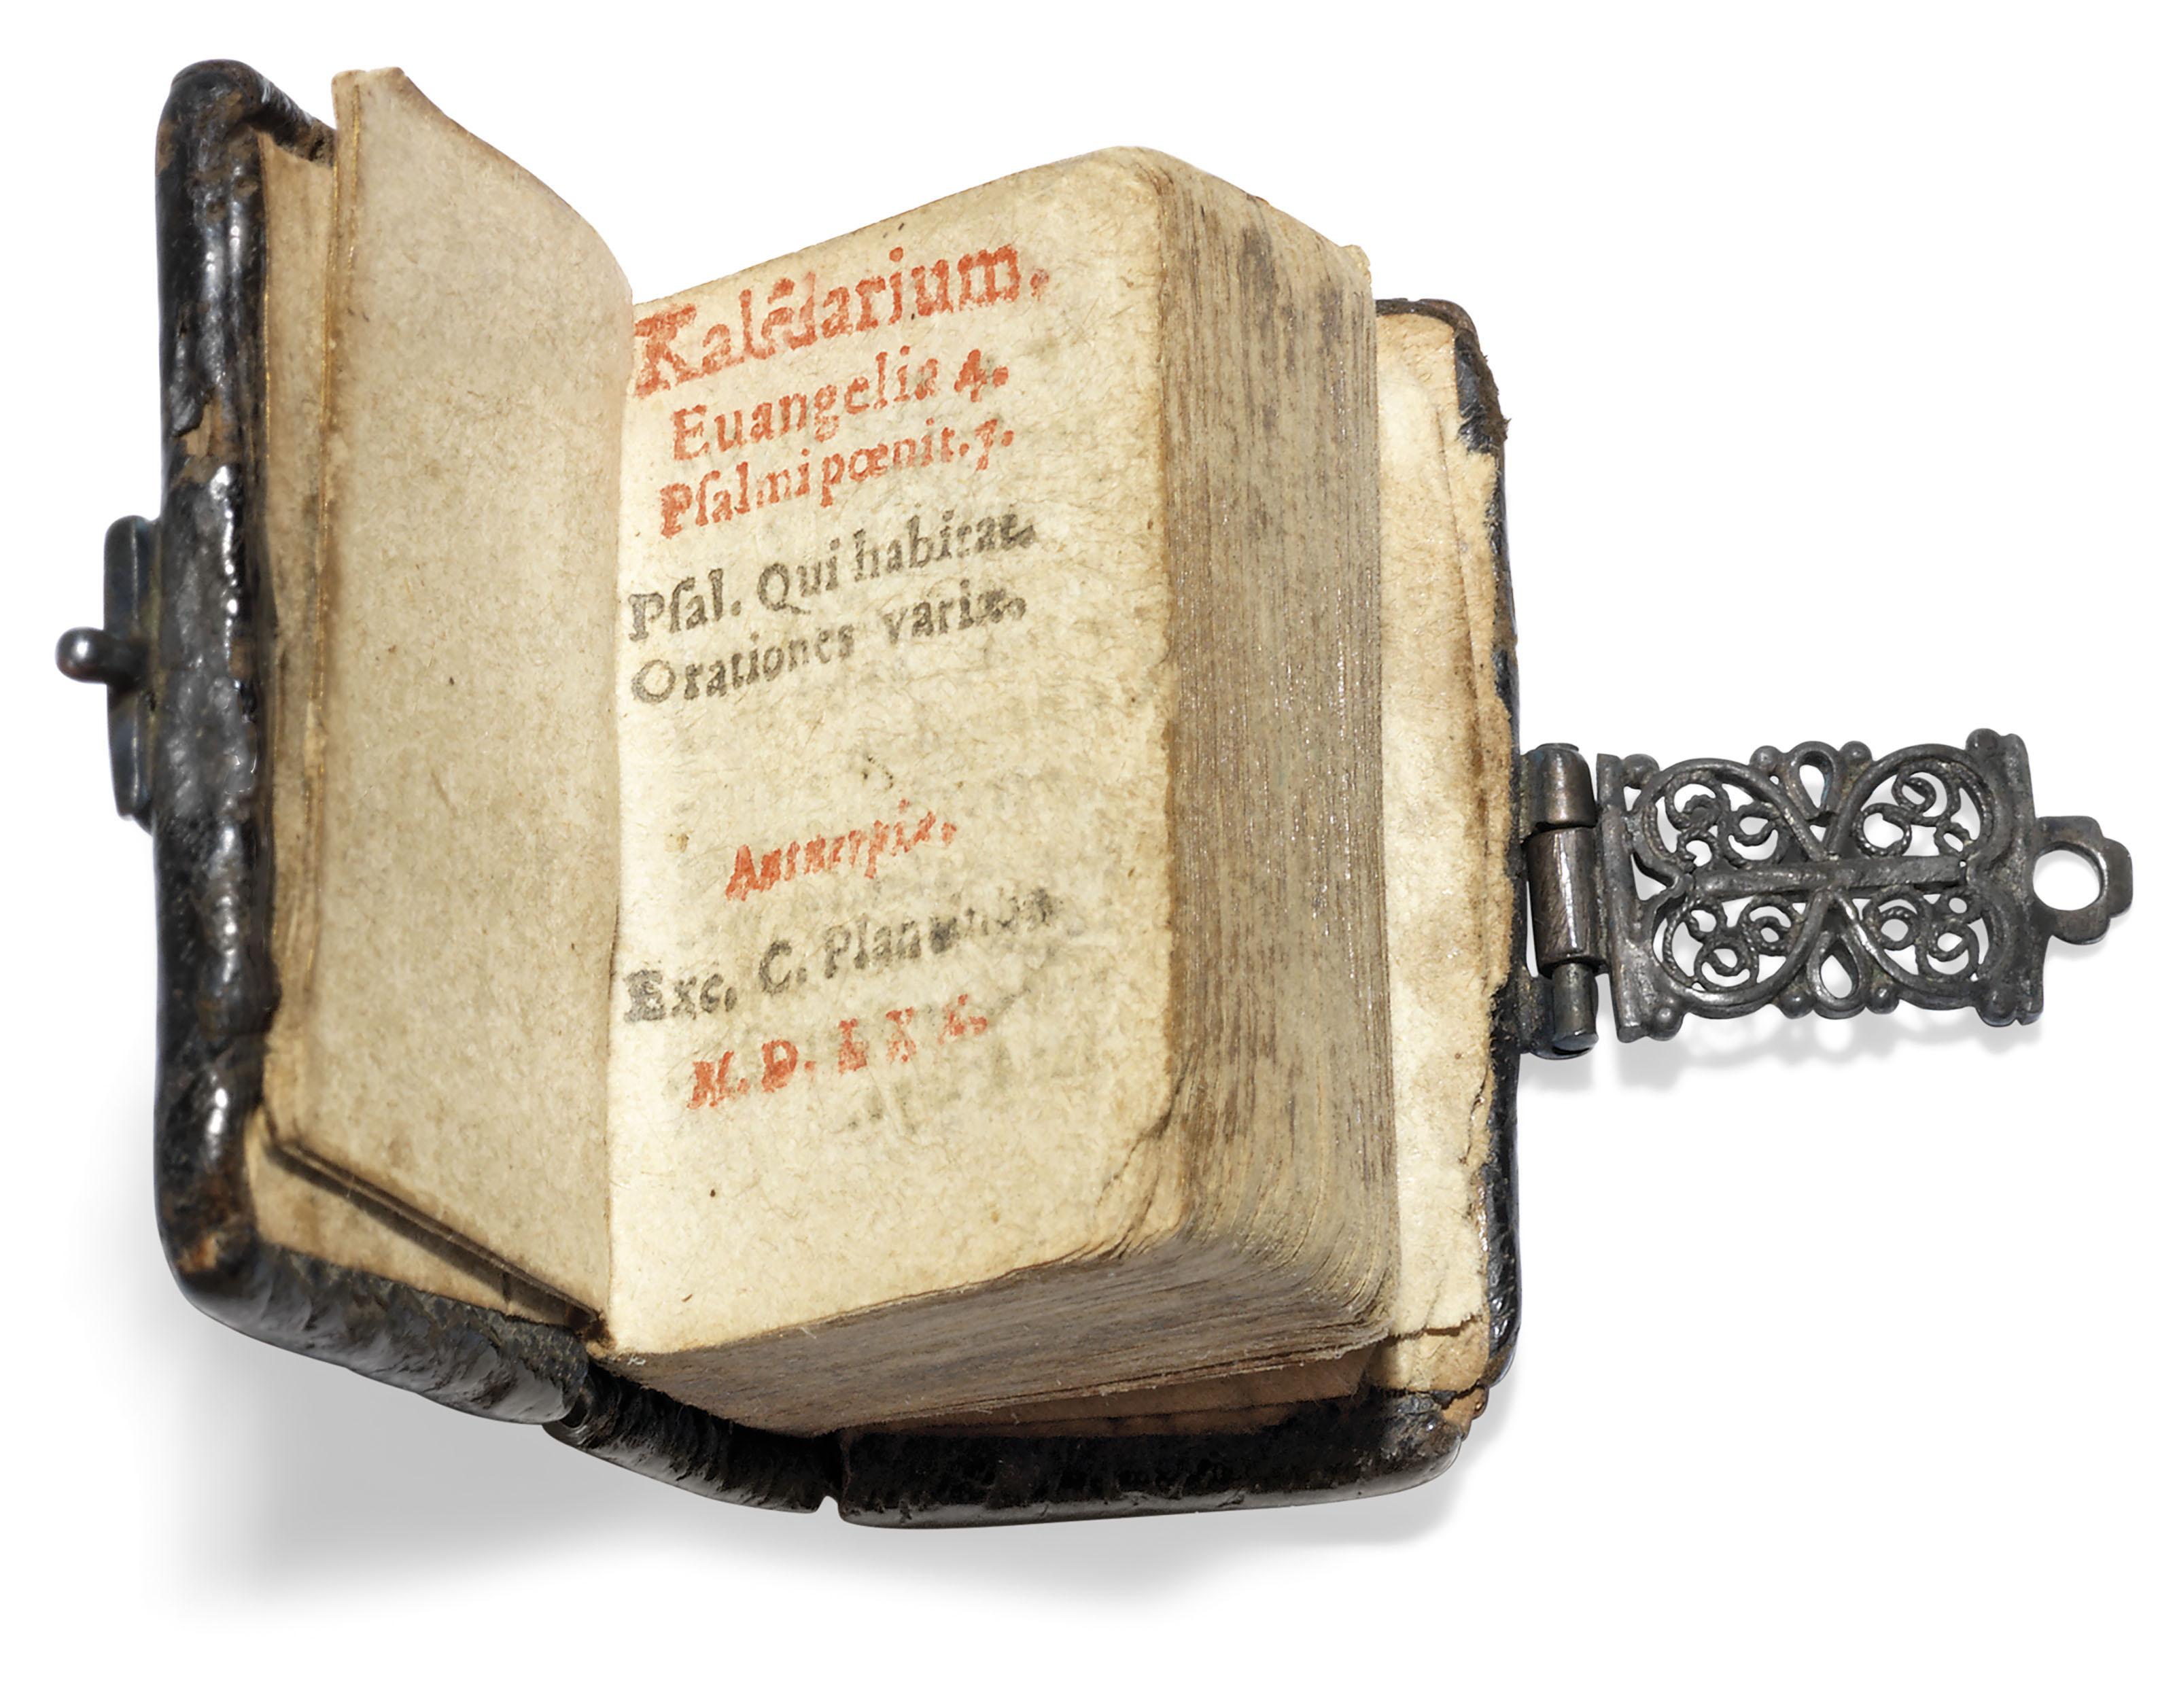 MINIATURE BOOK – Kalendarium. Evangelia 4. Psalmi poenit. 7. Antwerp: Christopher Plantin, 1570.